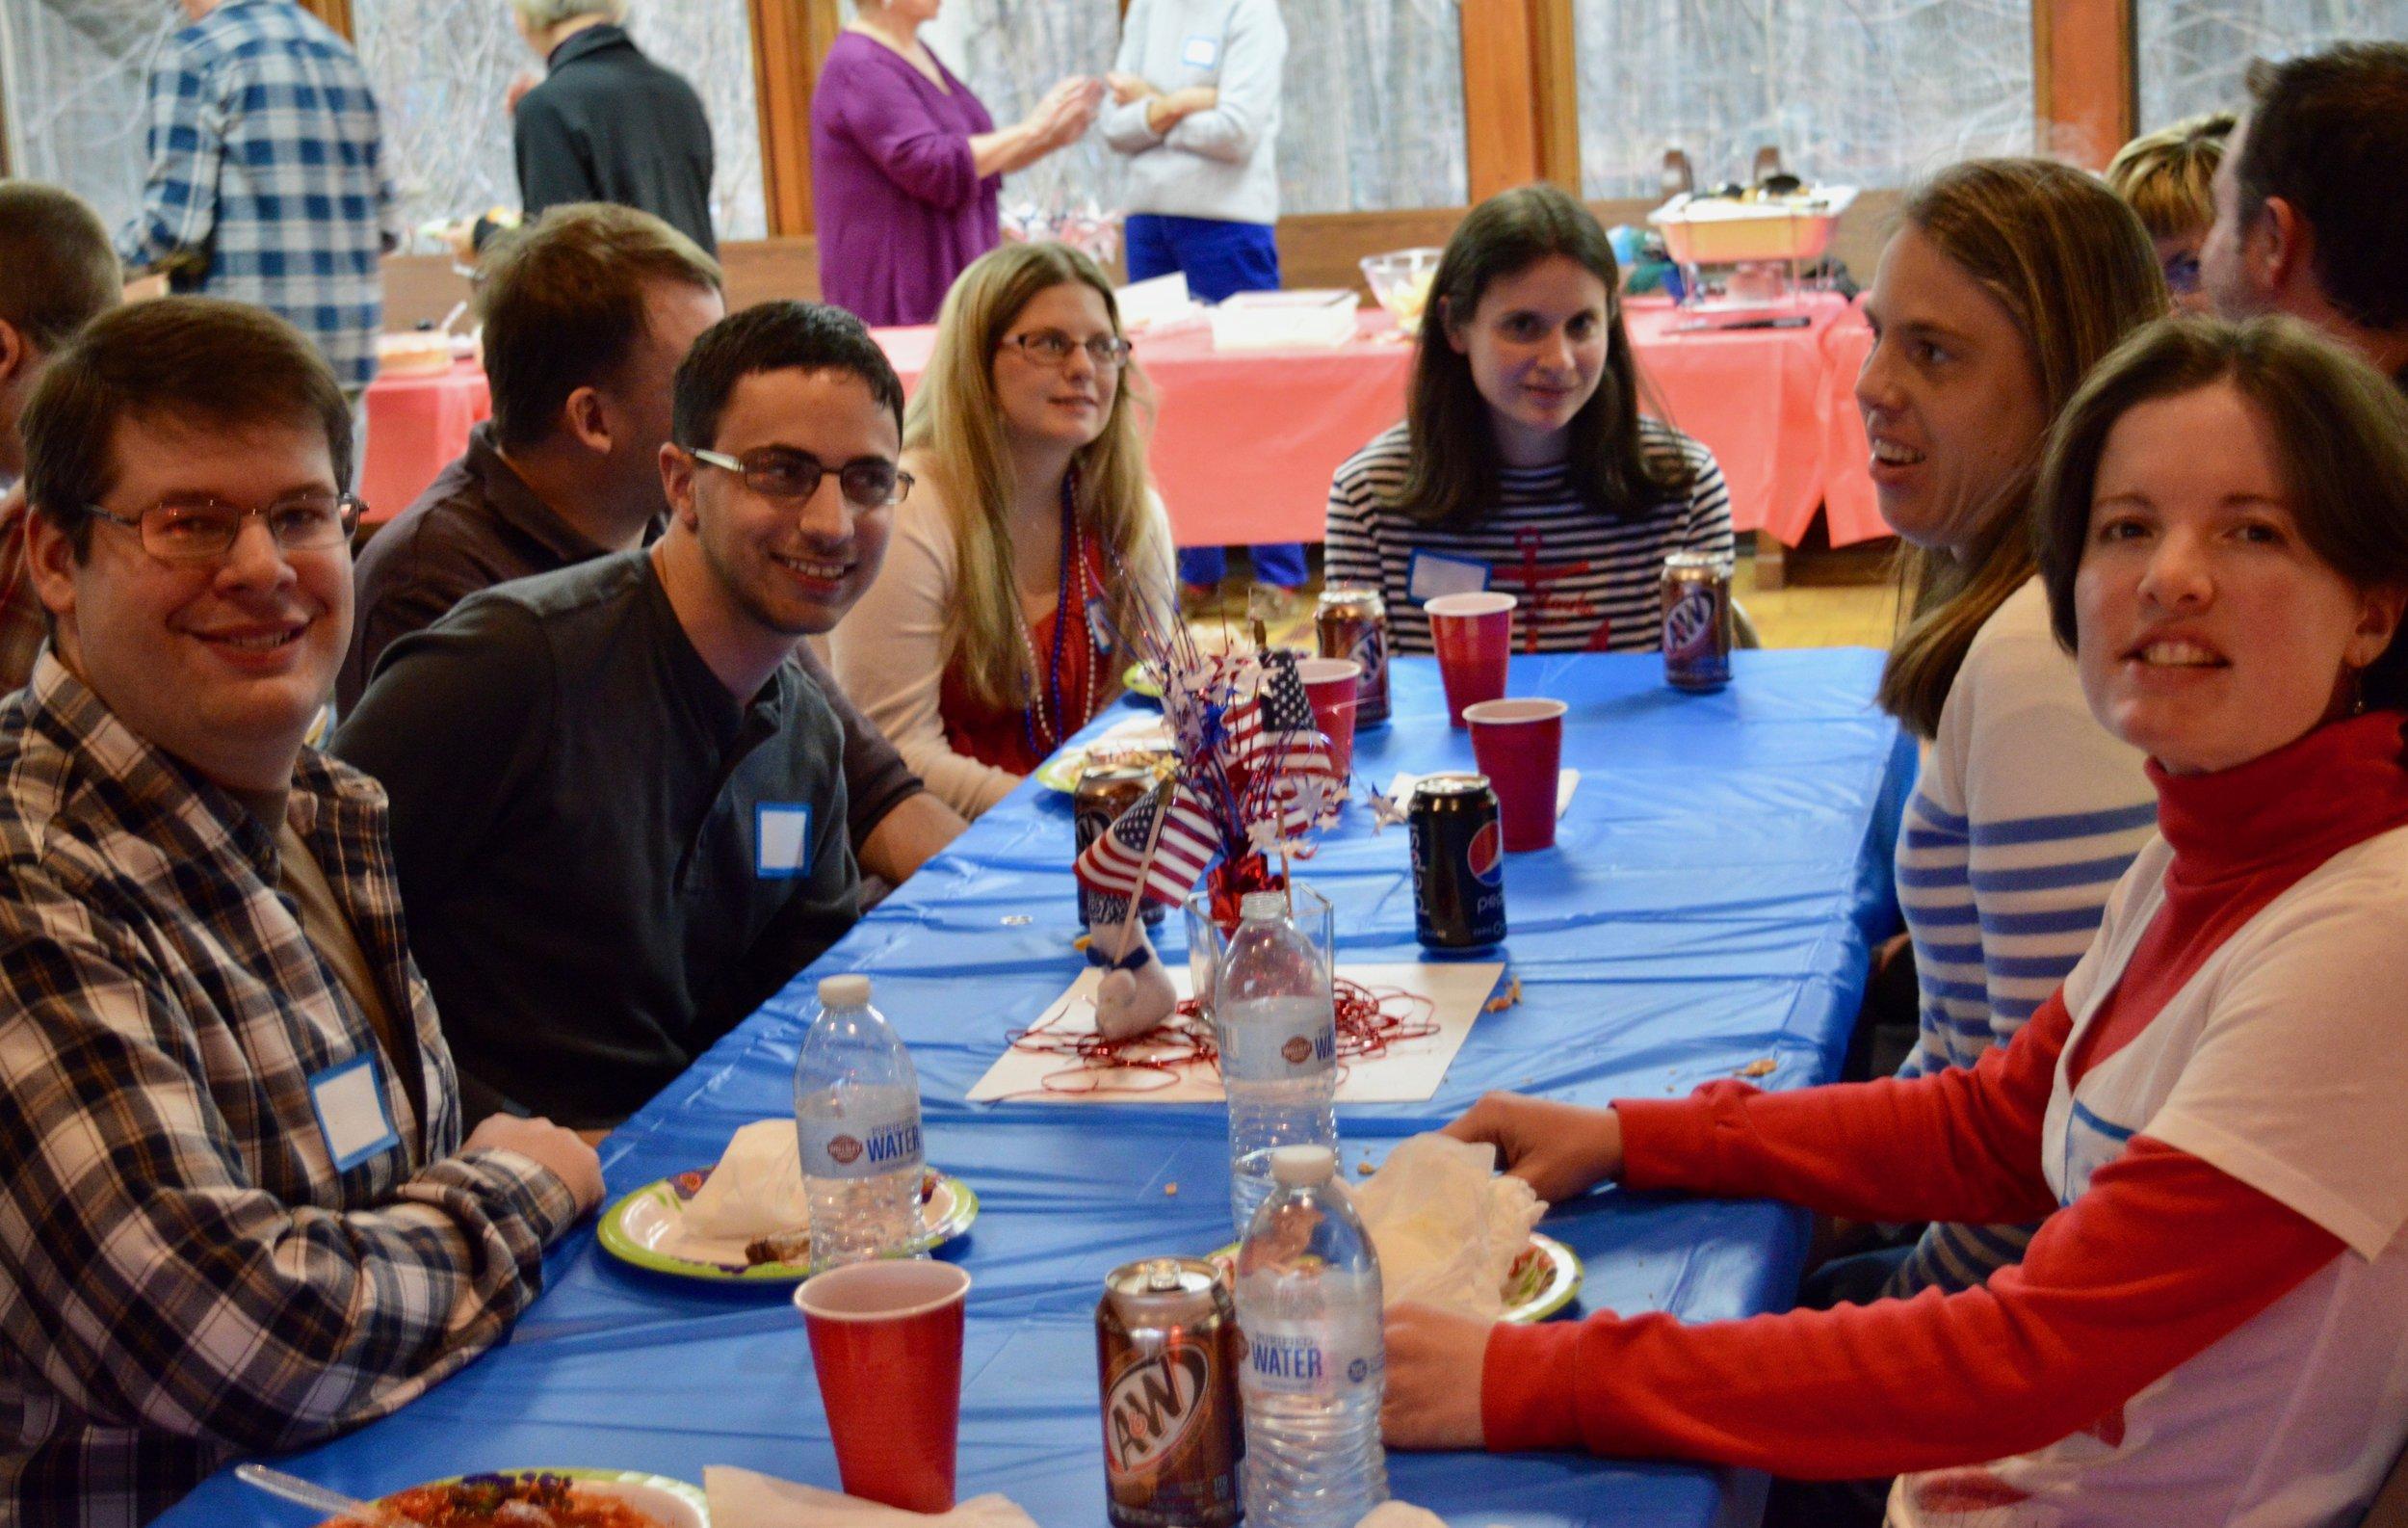 Group at table.jpg